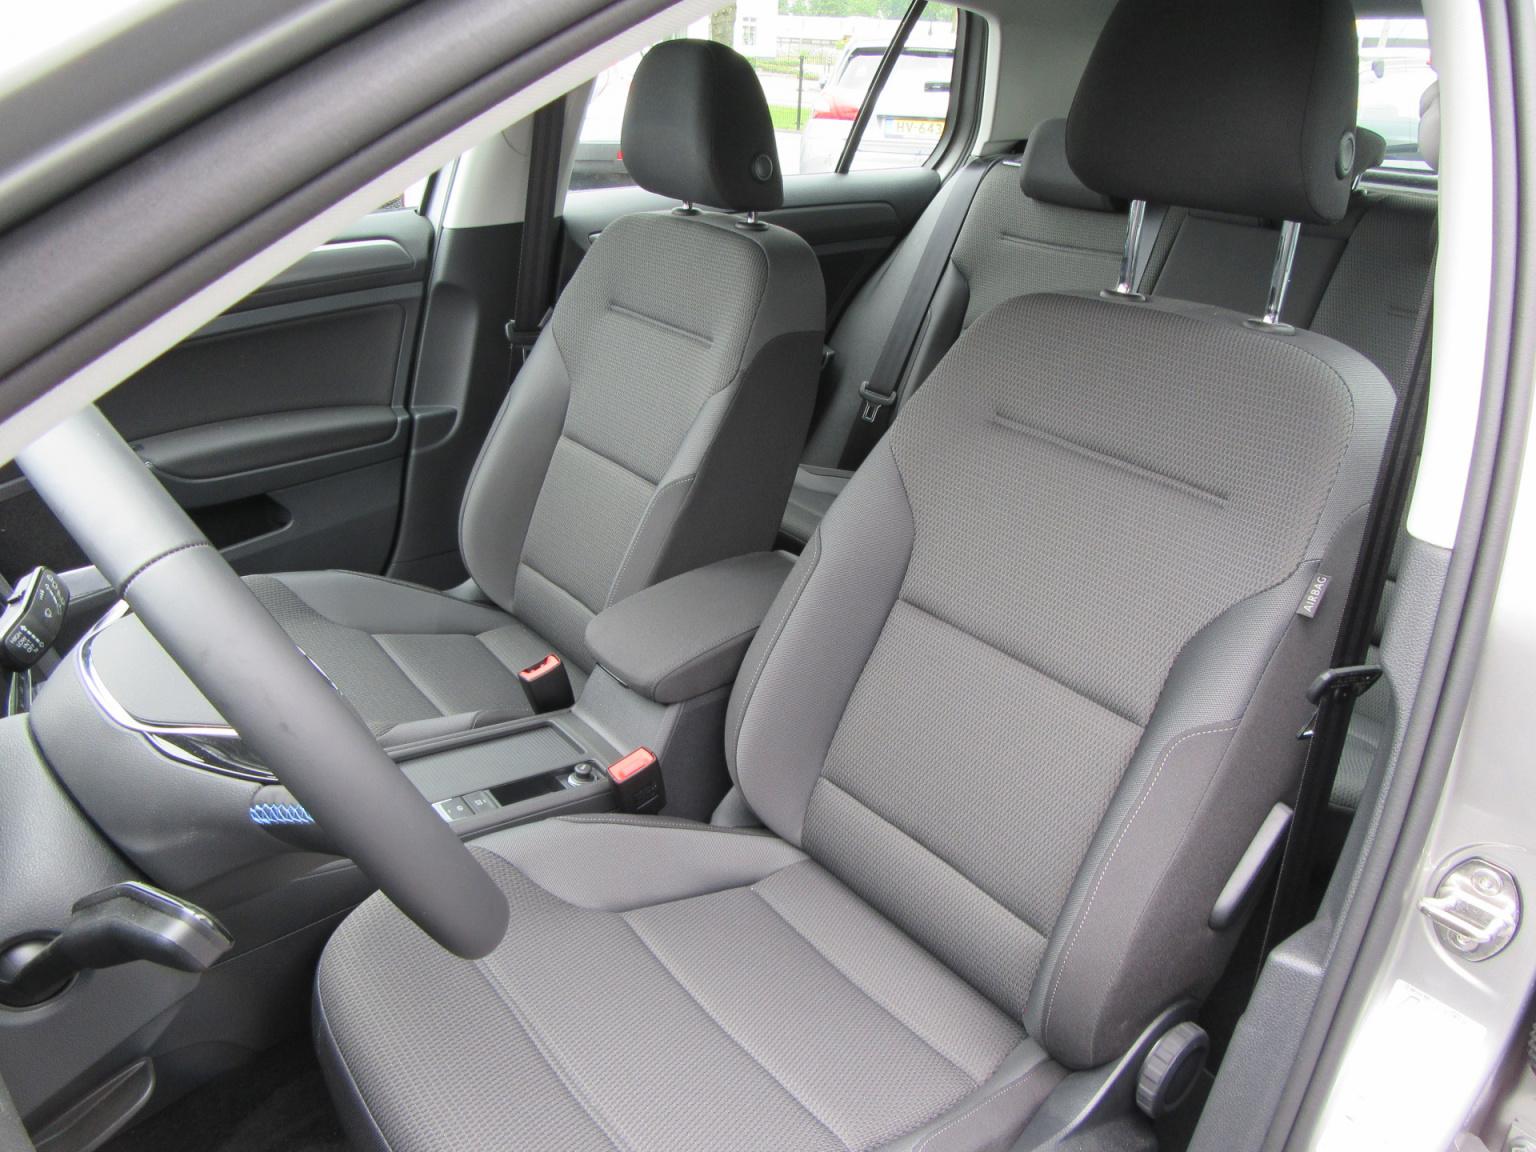 Volkswagen-e-Golf-19